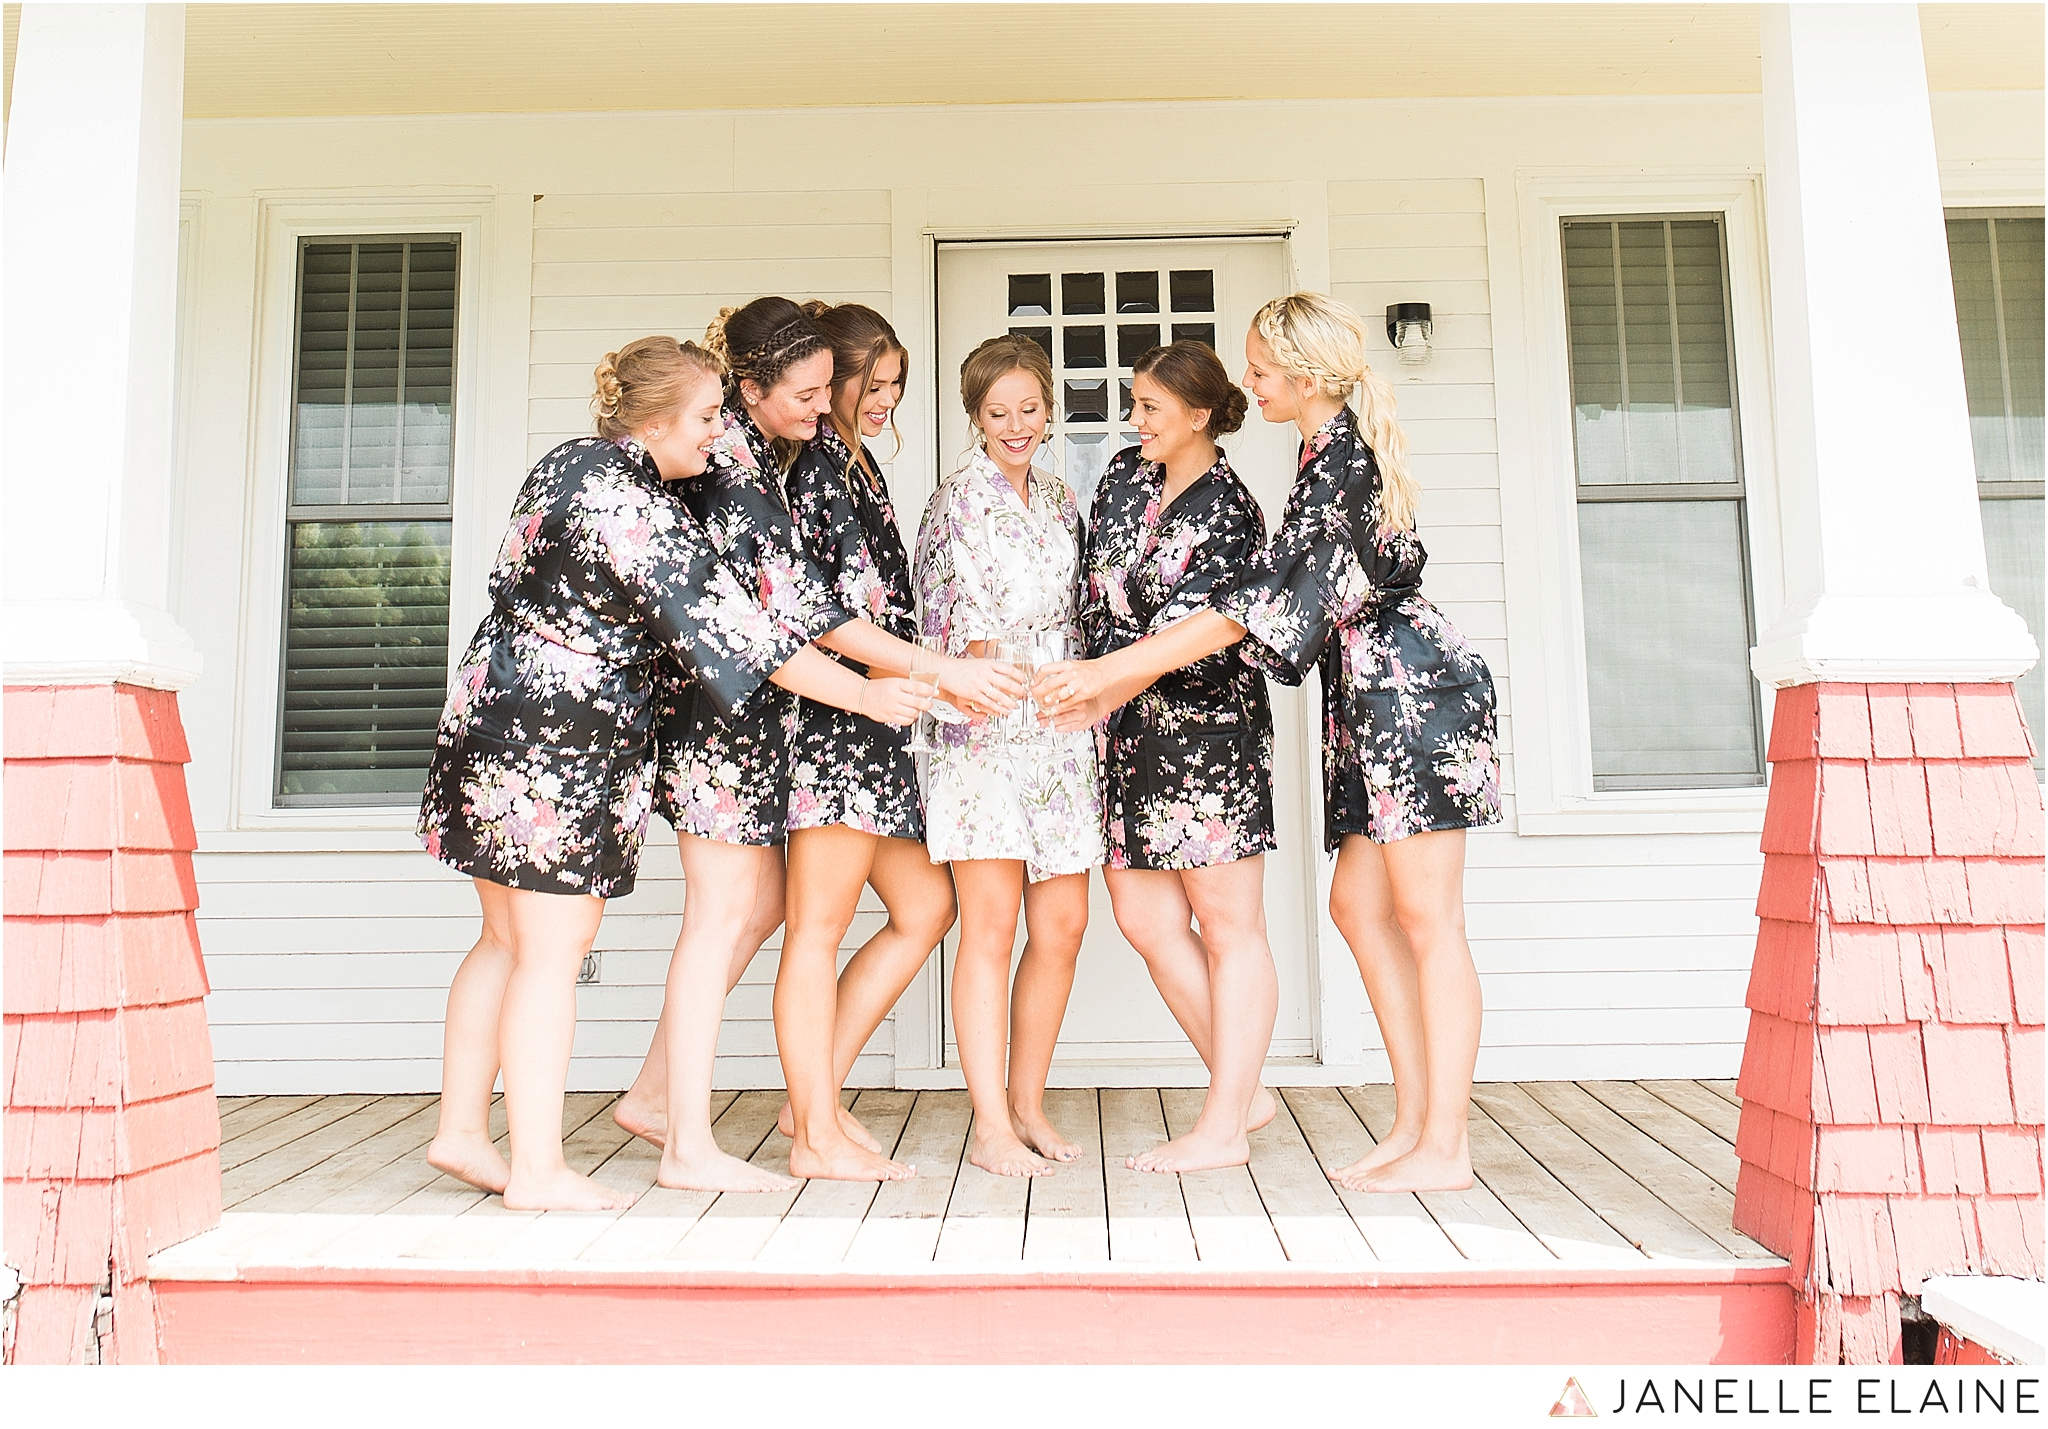 warnsholz-wedding-michigan-photography-janelle elaine photography-12.jpg